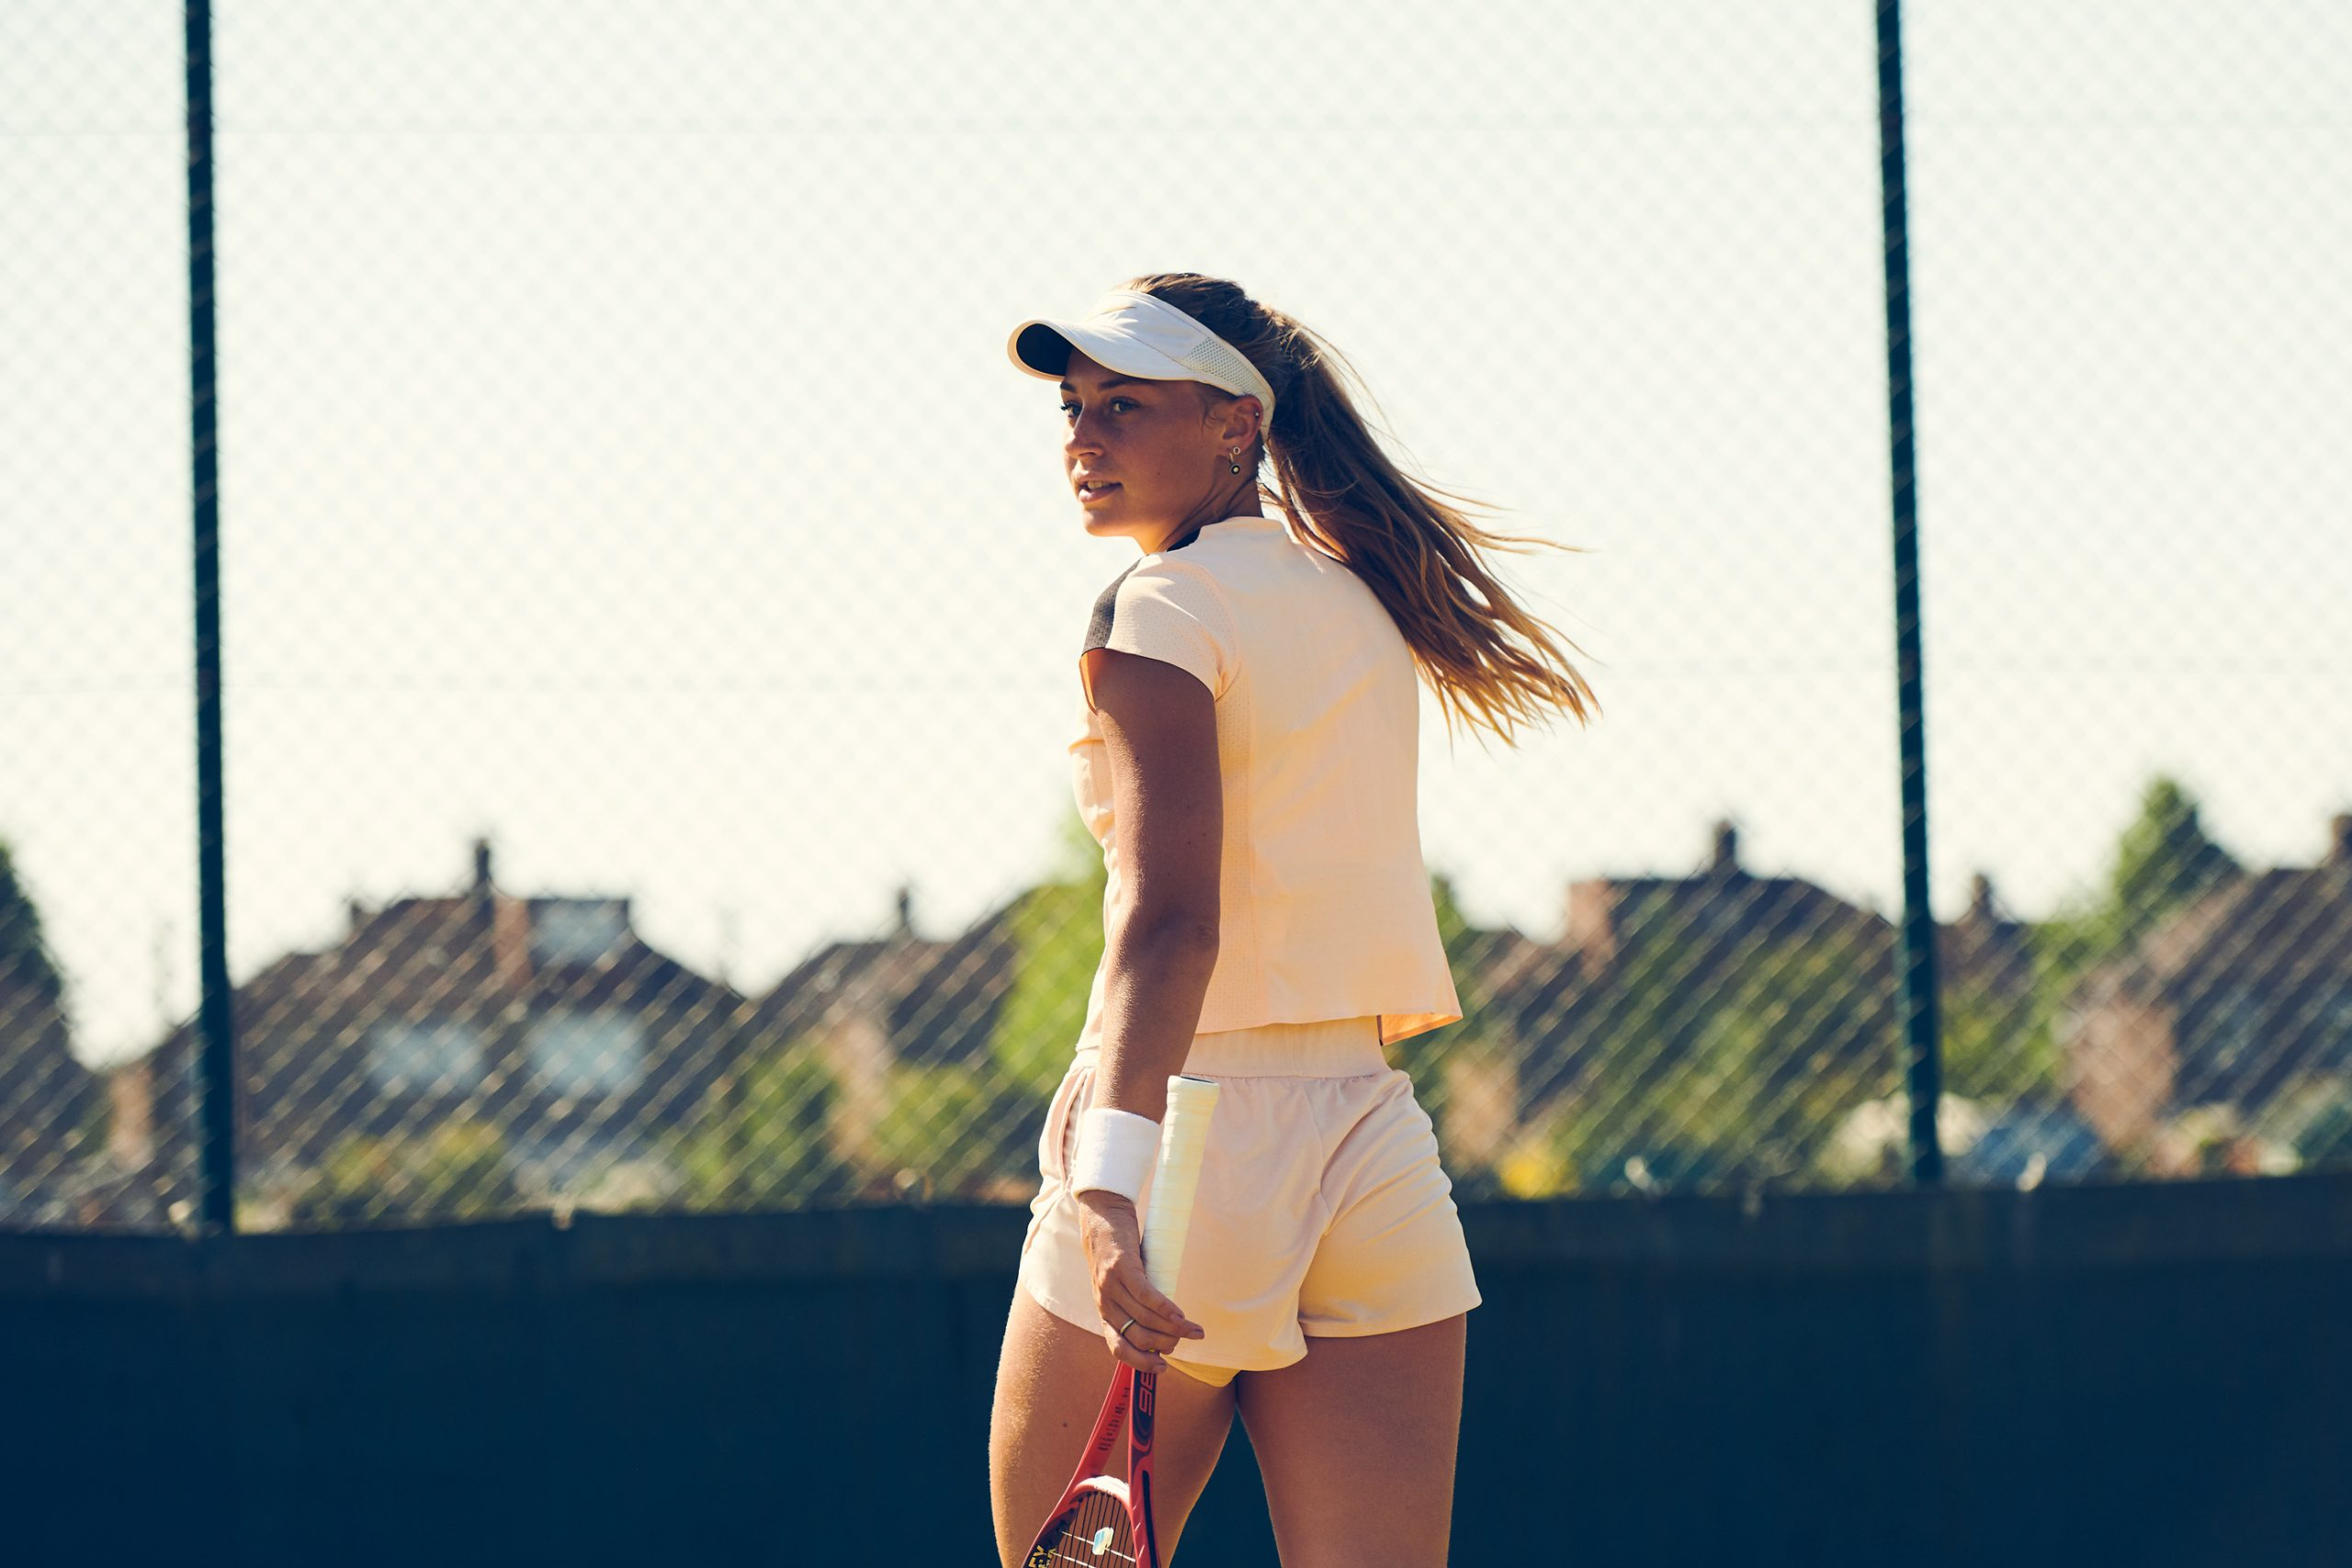 Forte_Olivia_Tennis_0630